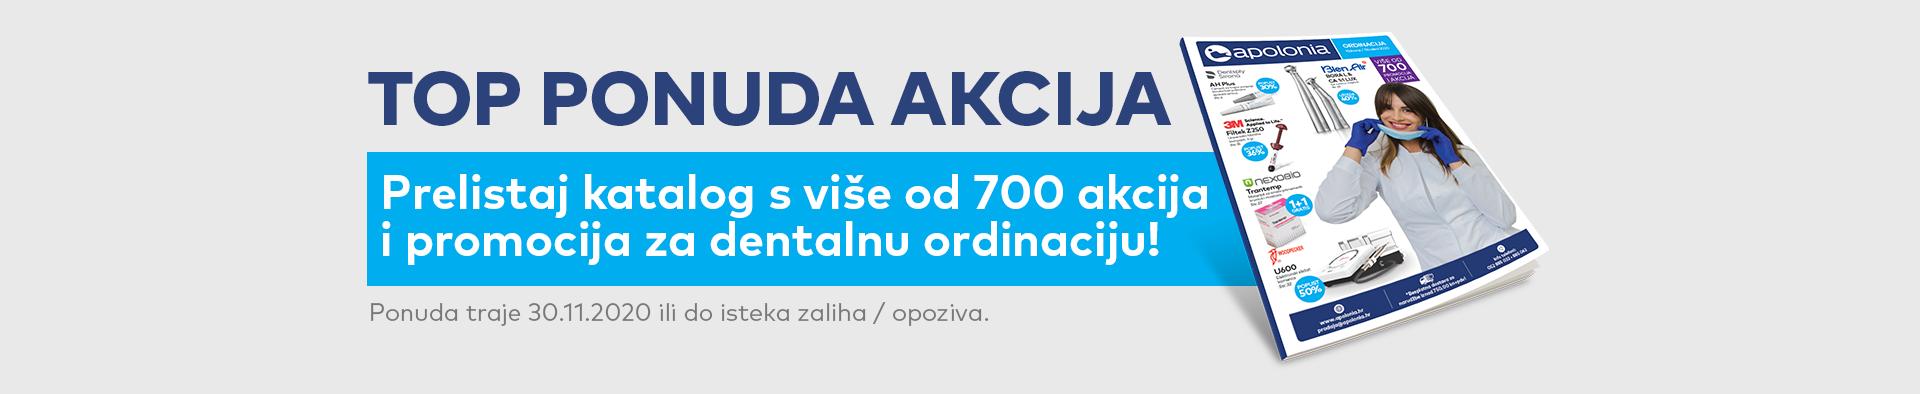 apolonia_katalog-dentalne-ordinacije-ljeto-jesen-2020